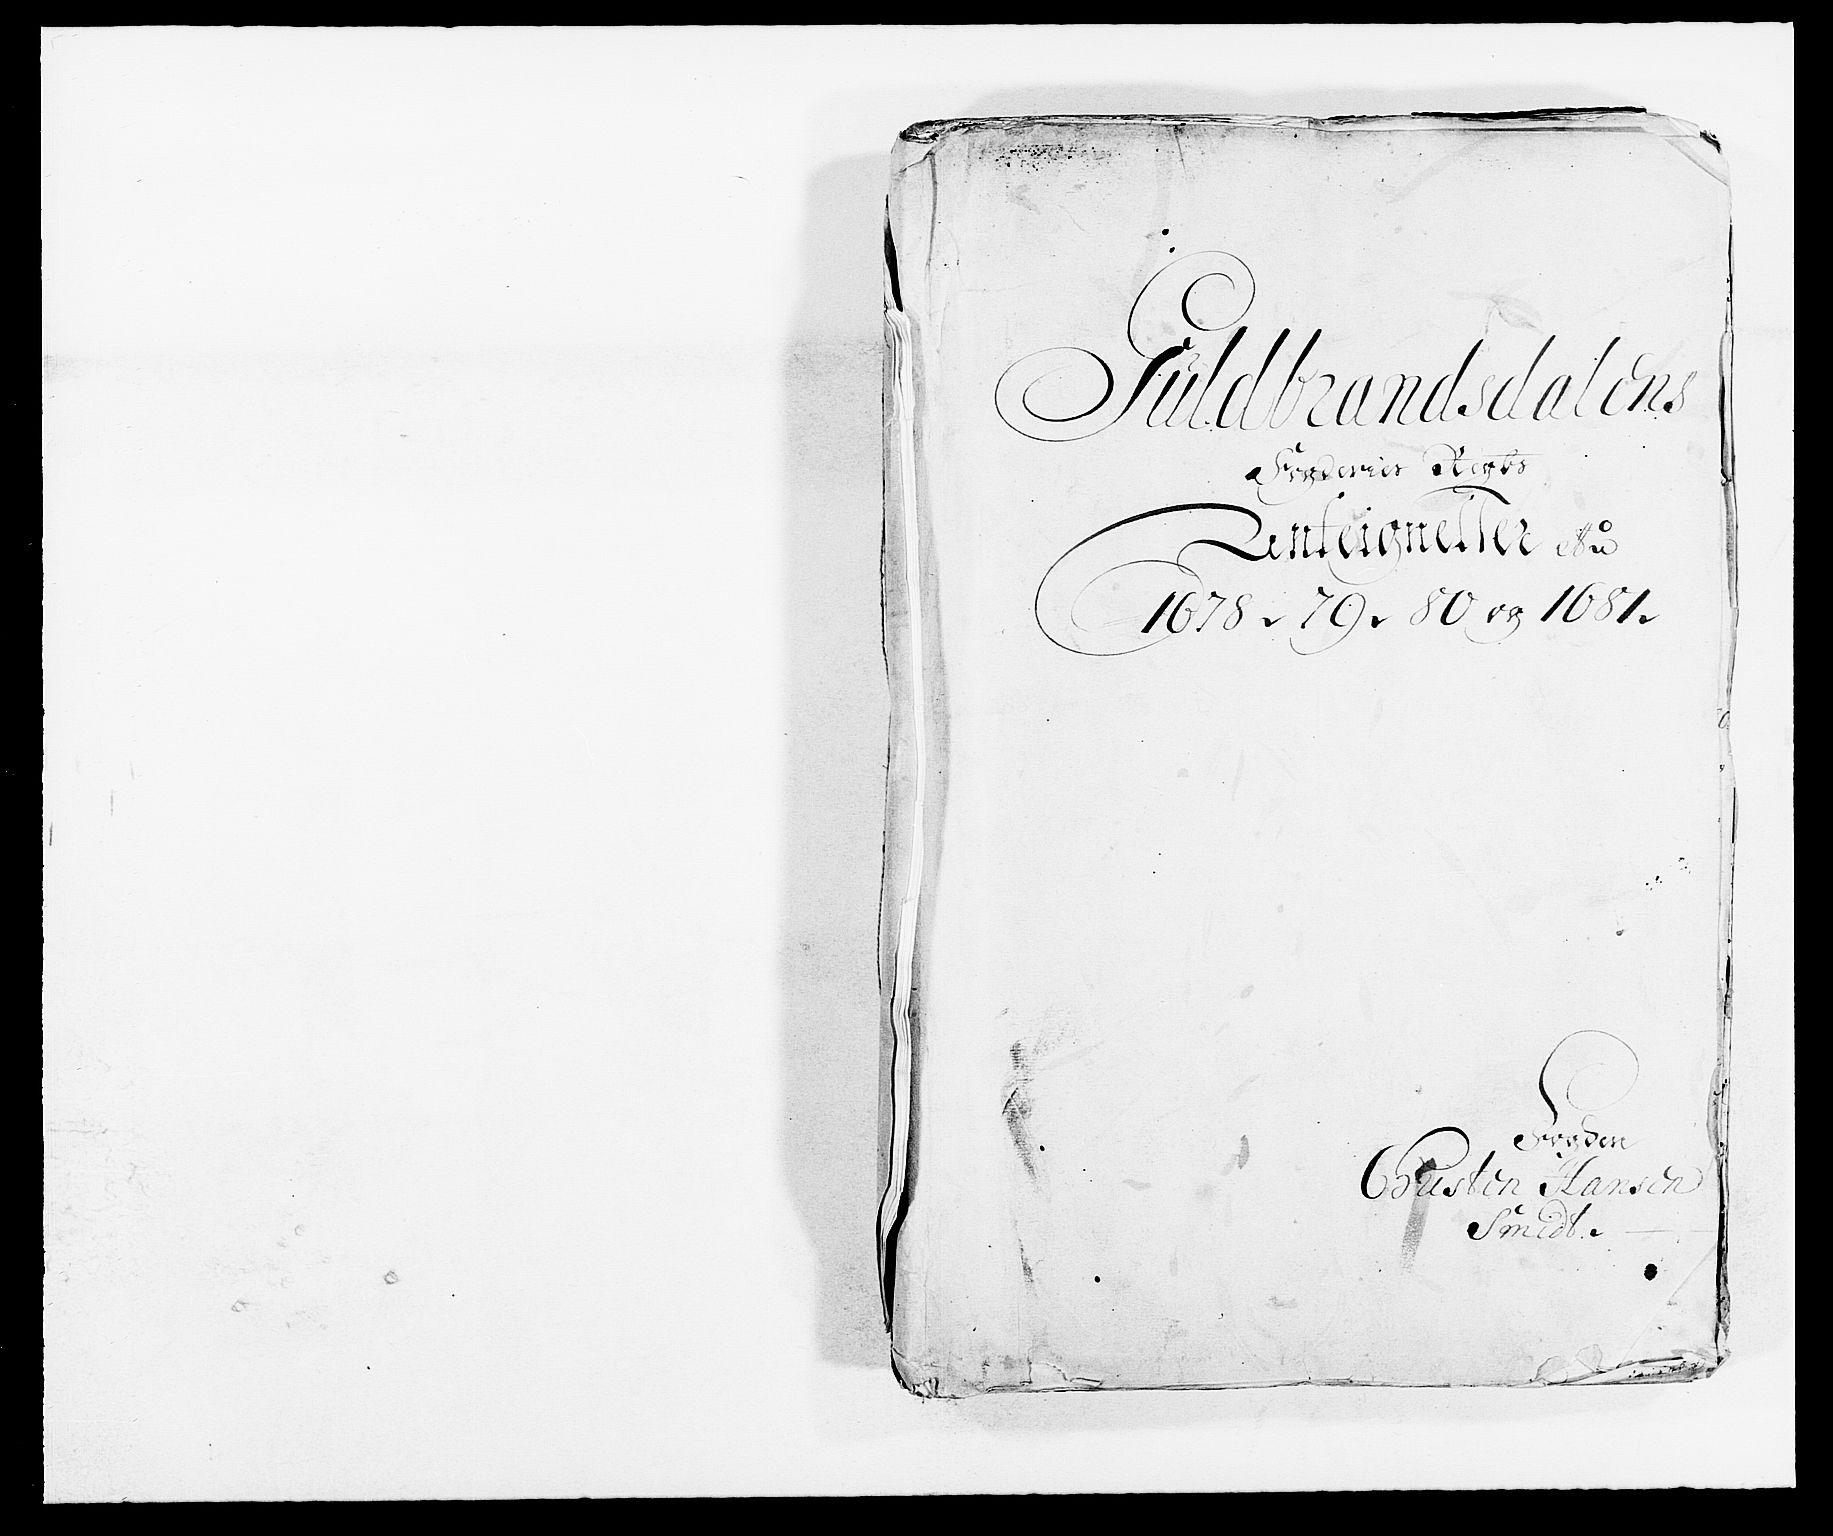 RA, Rentekammeret inntil 1814, Reviderte regnskaper, Fogderegnskap, R17/L1156: Fogderegnskap Gudbrandsdal, 1681, s. 183